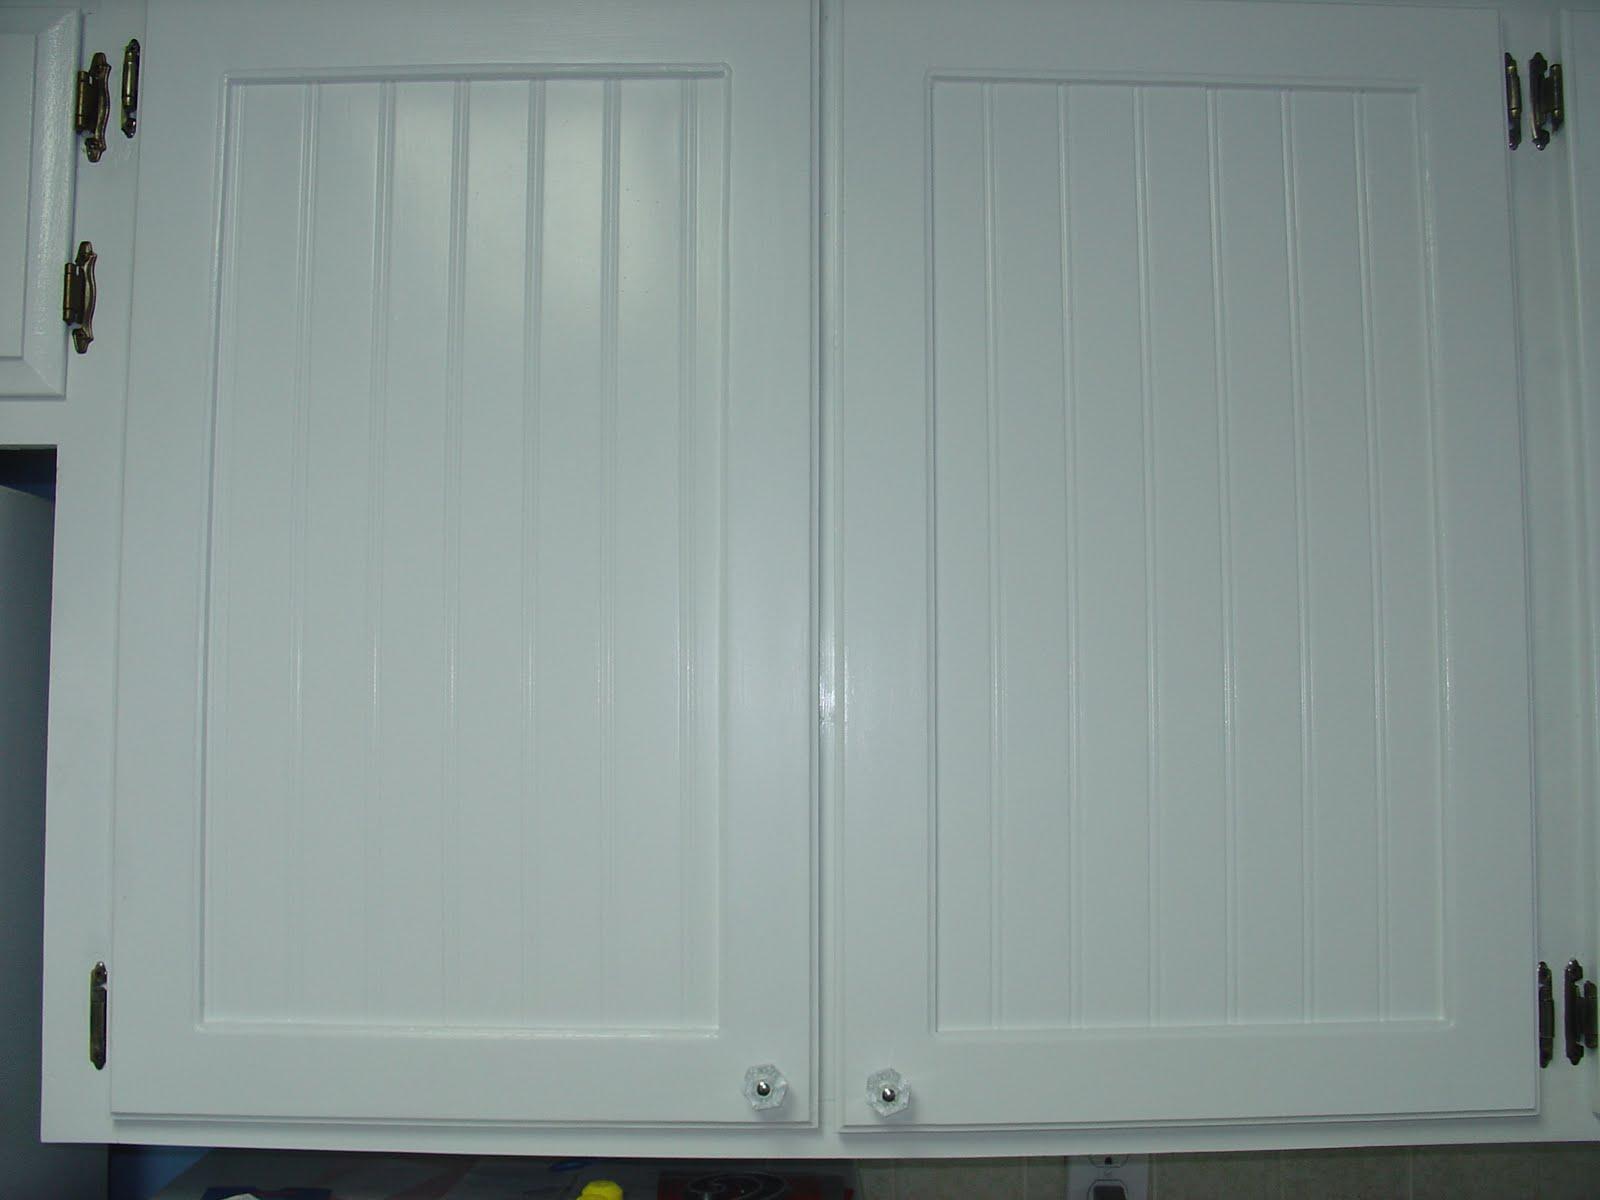 kitchen cabinets doors new kitchen cabinets new kitchen cabinet doors The